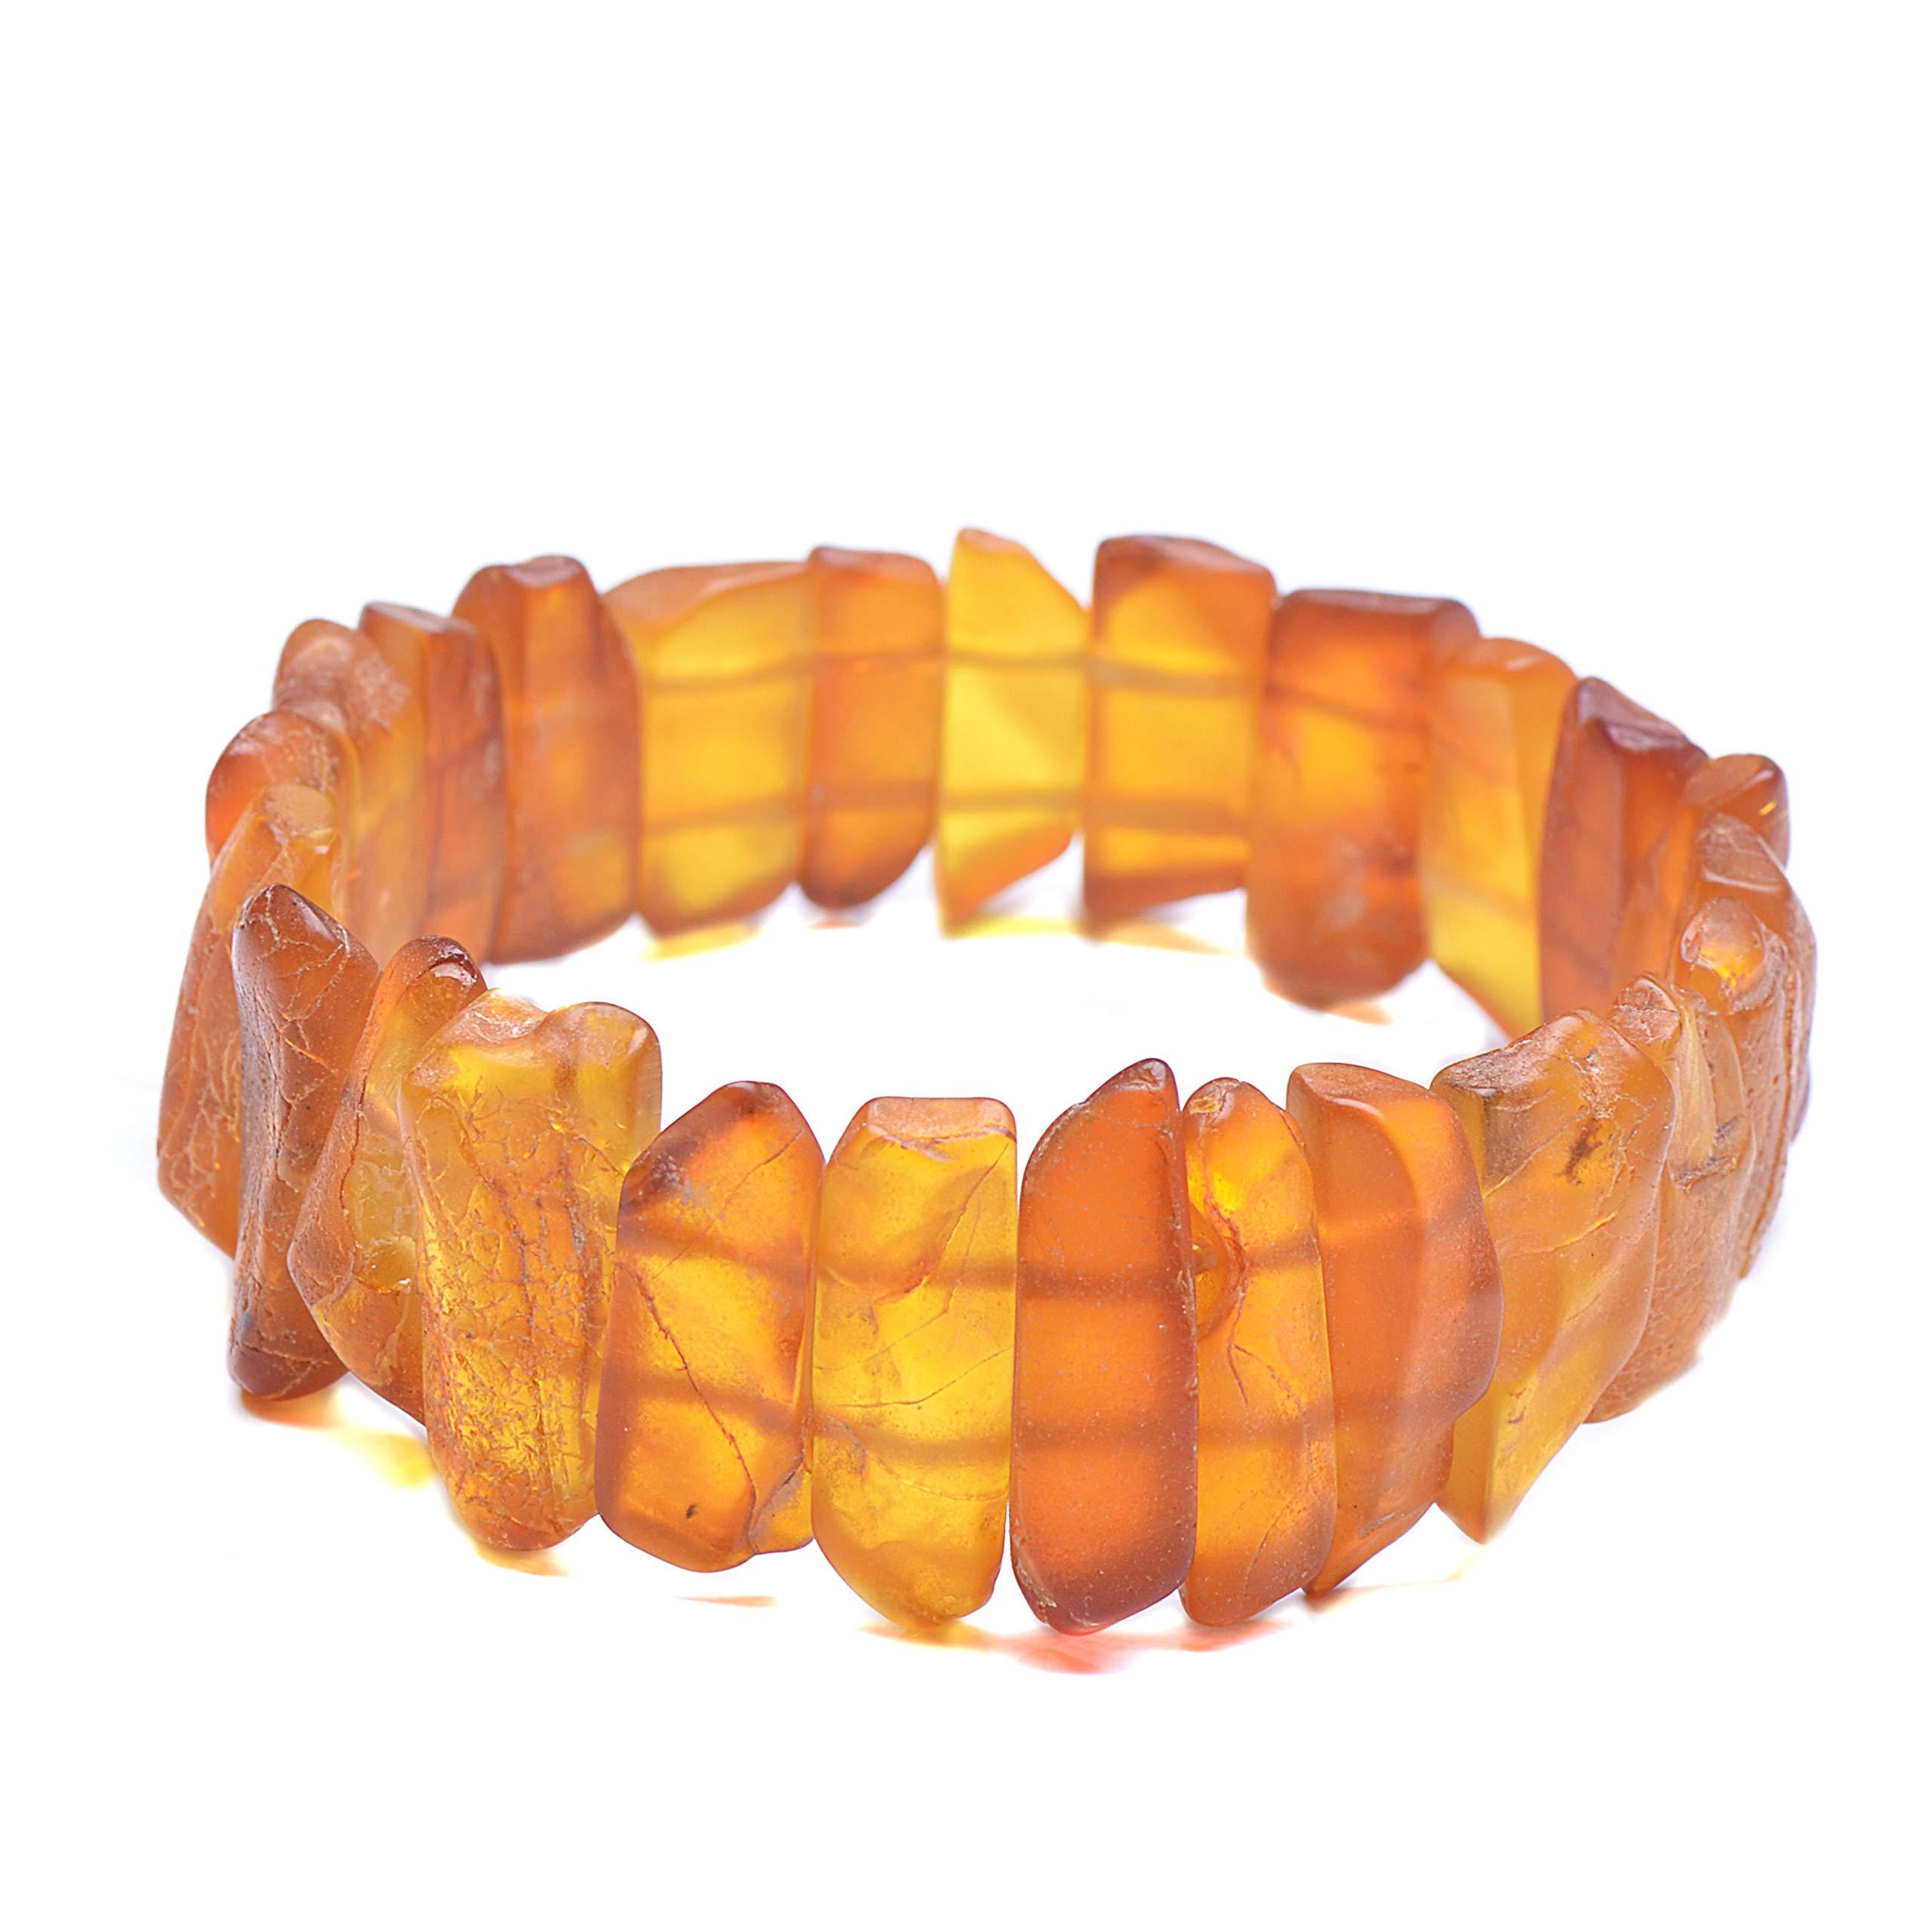 Amber Bracelet - Unique Amber Bracelet - Exclusive Amber Bracelet - Vintage Bracelet - Genuine Baltic Amber by Genuine Amber (Image #3)